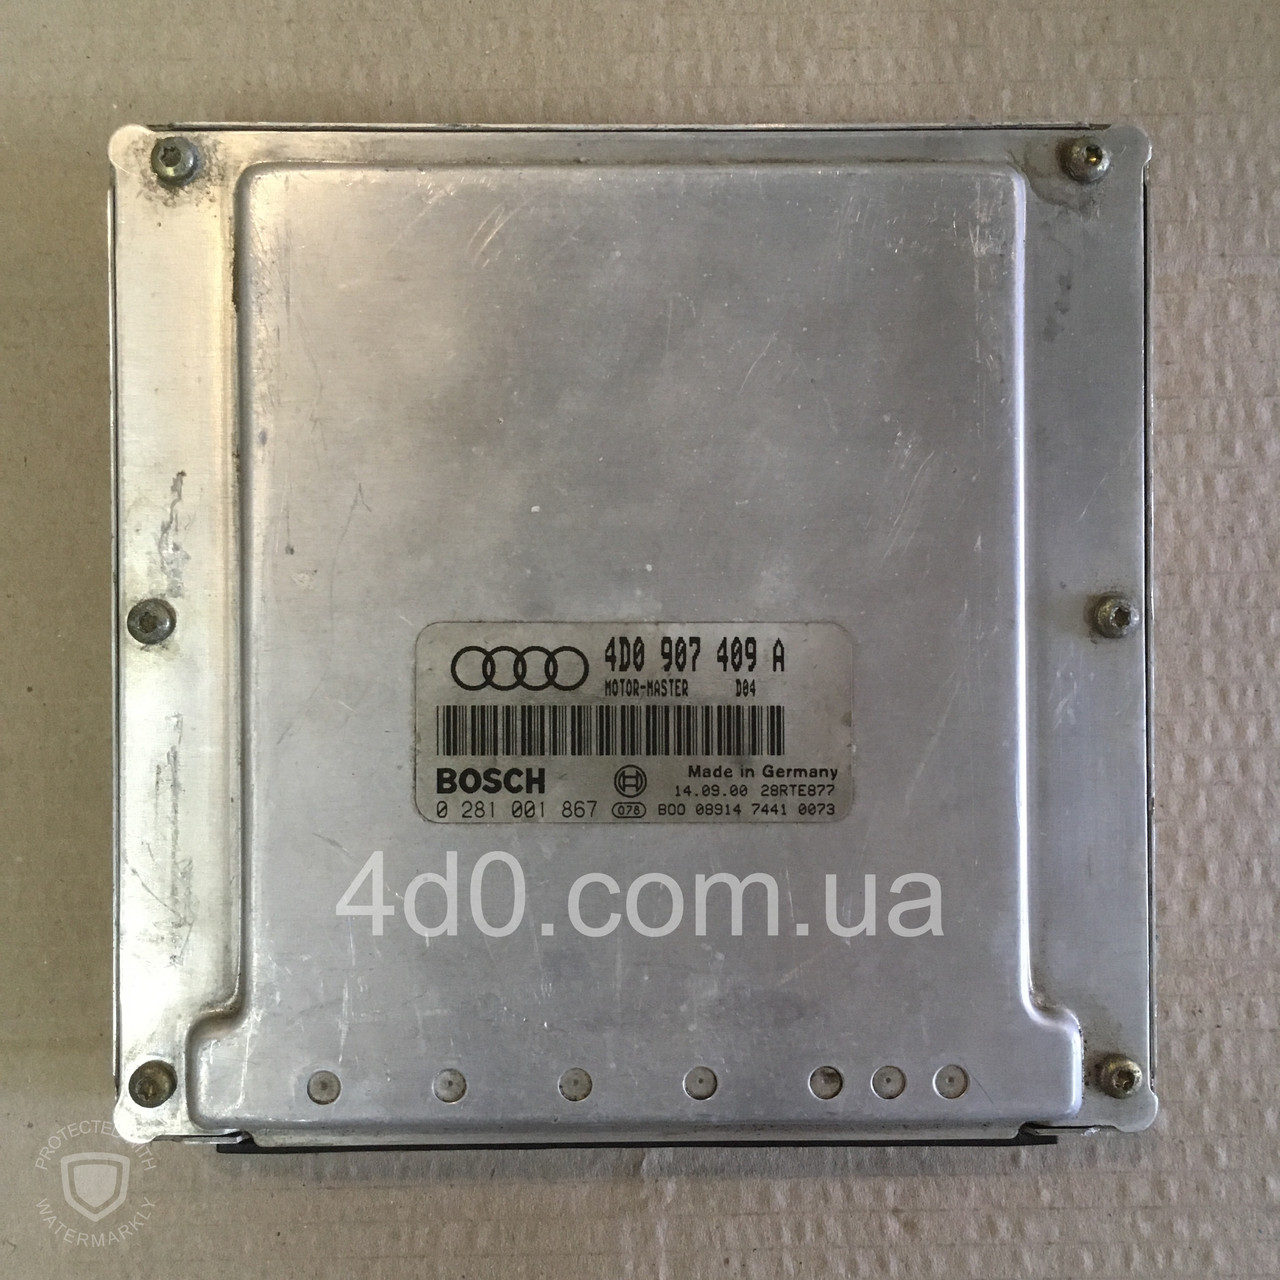 4D0907409A Блок управління двигуном на Audi A8 D2 3.3 дизель